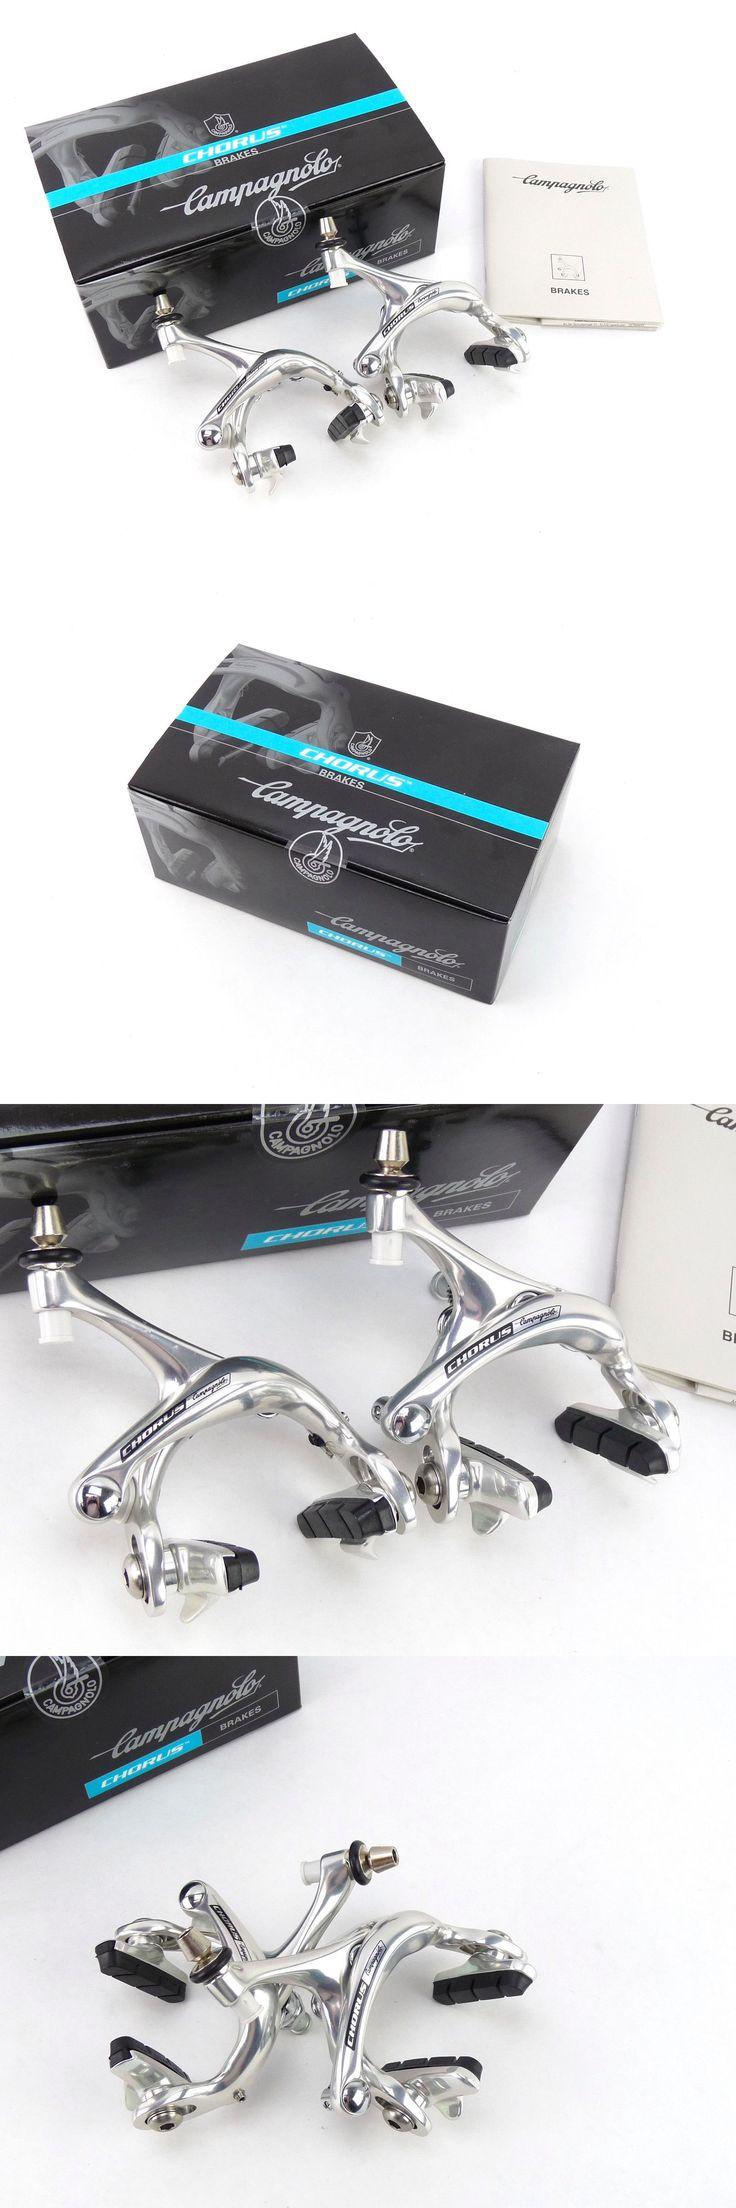 Vintage Bicycle Parts 56197: Campagnolo Chorus 10 Speed Brakeset Dual Pivot Brakes Record Set 2006 Nos -> BUY IT NOW ONLY: $143.2 on eBay!